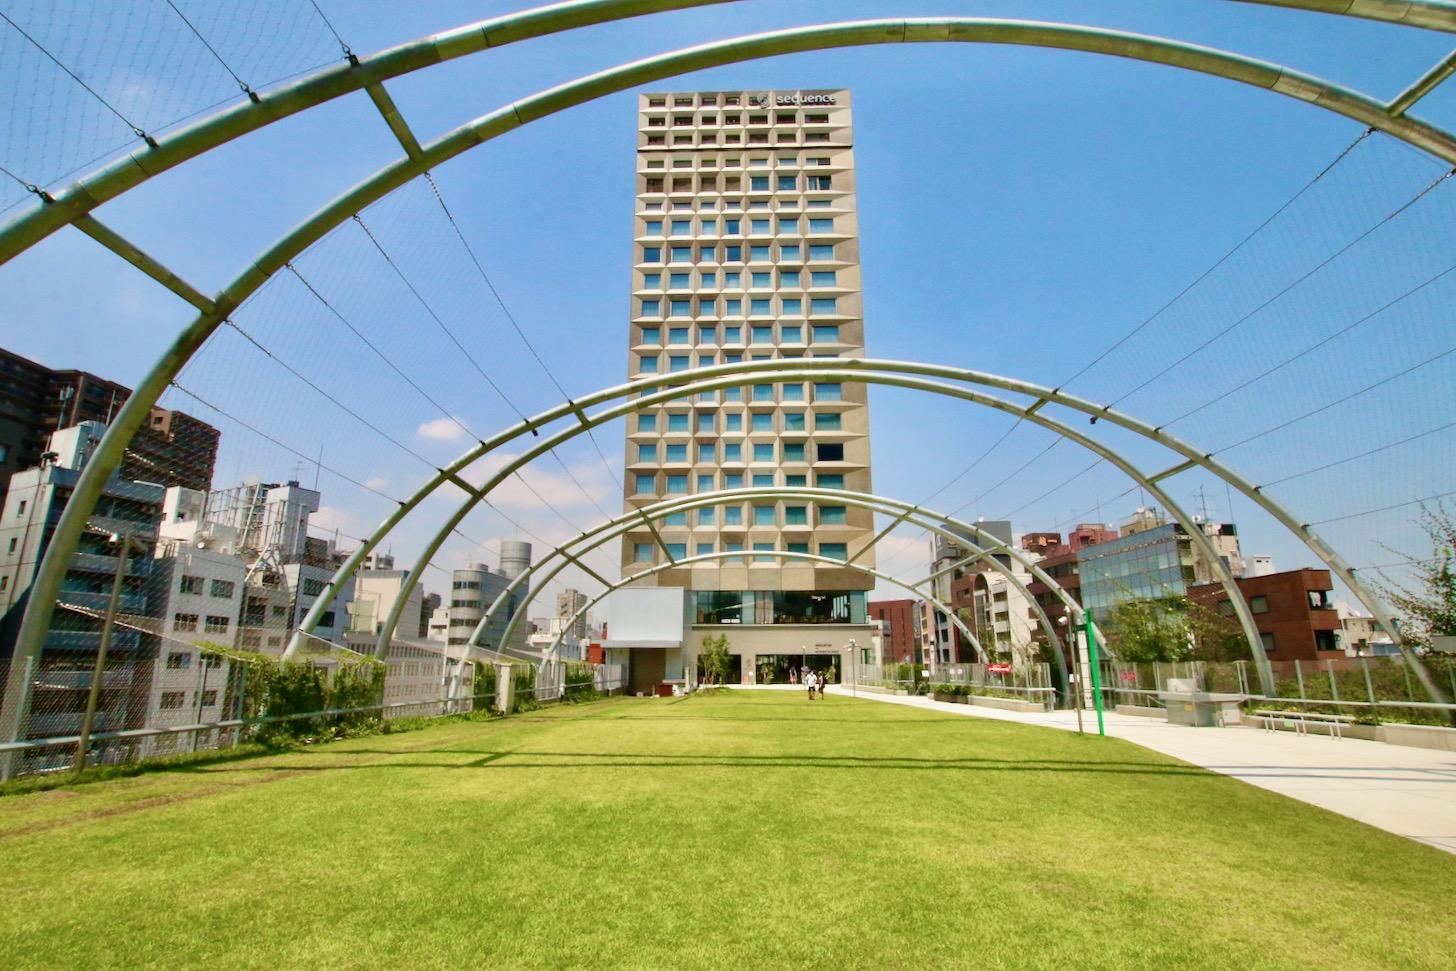 Miyashita Parkの屋上は宮下公園の芝生広場